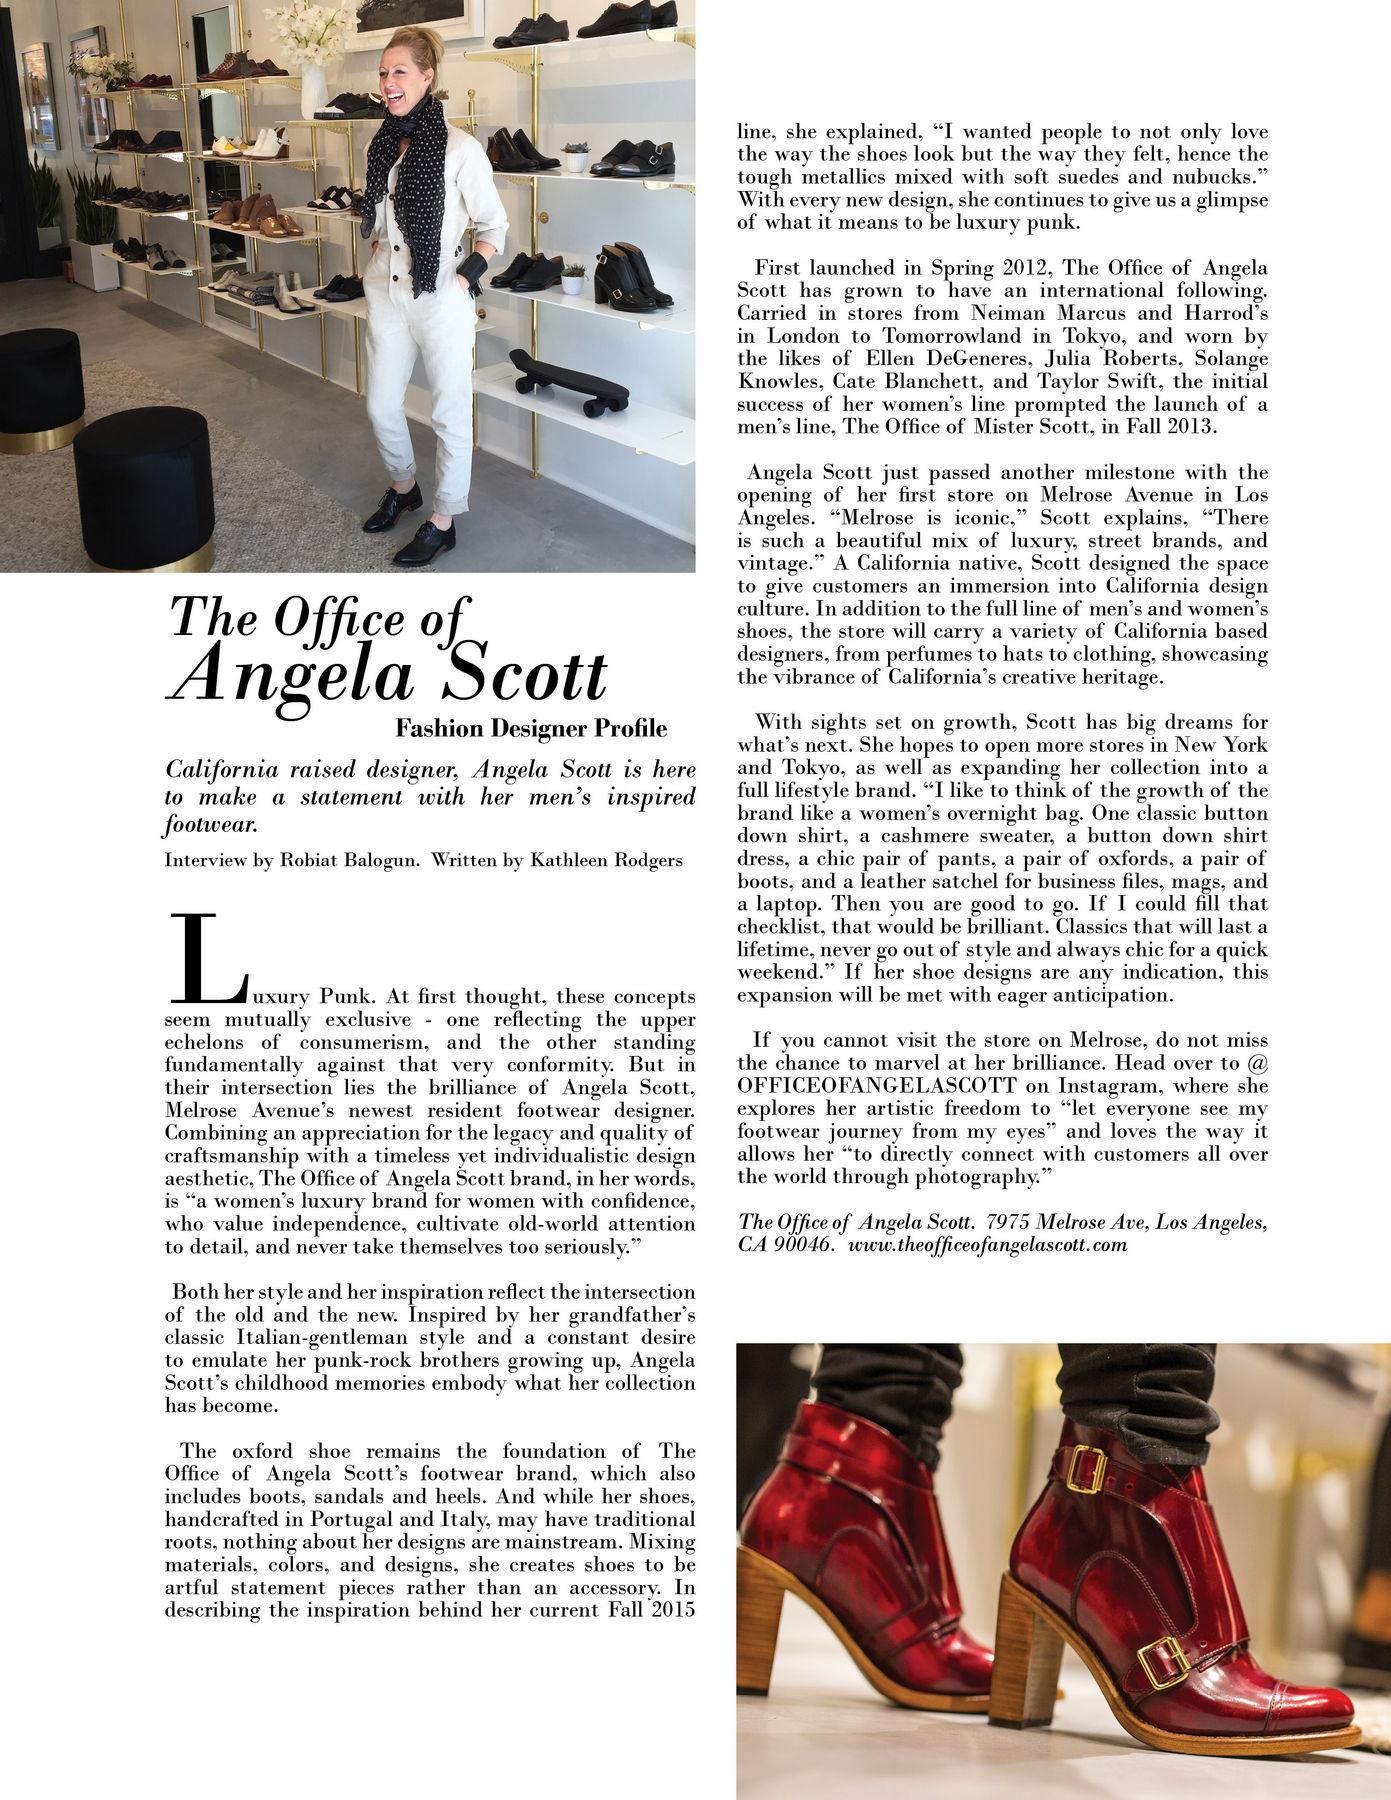 Fashion Designer Profile: The Office of Angela Scott